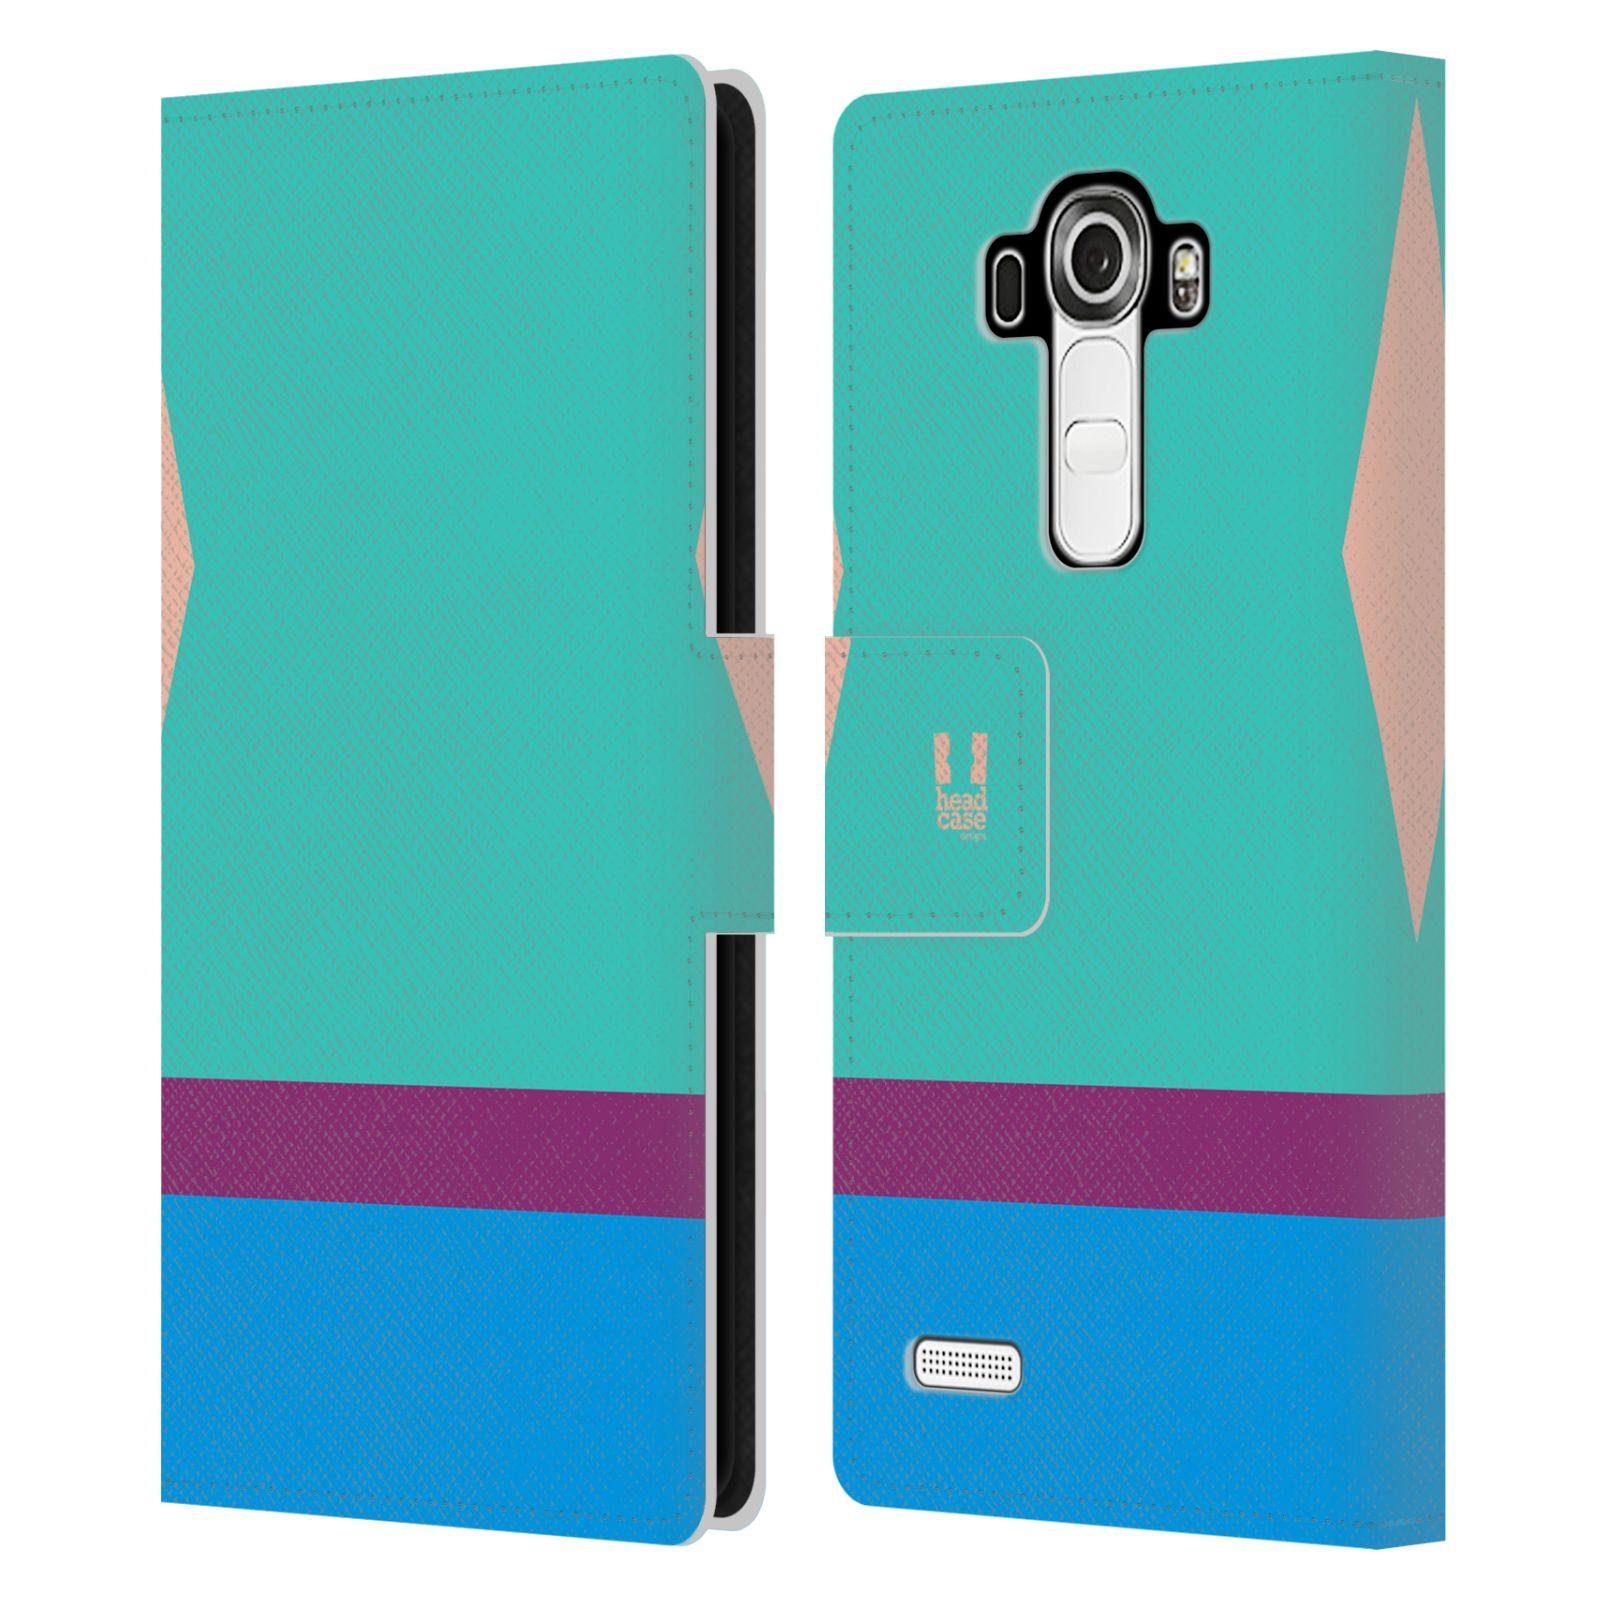 HEAD CASE Flipové pouzdro pro mobil LG G4 barevné tvary modrá a fialový pruh